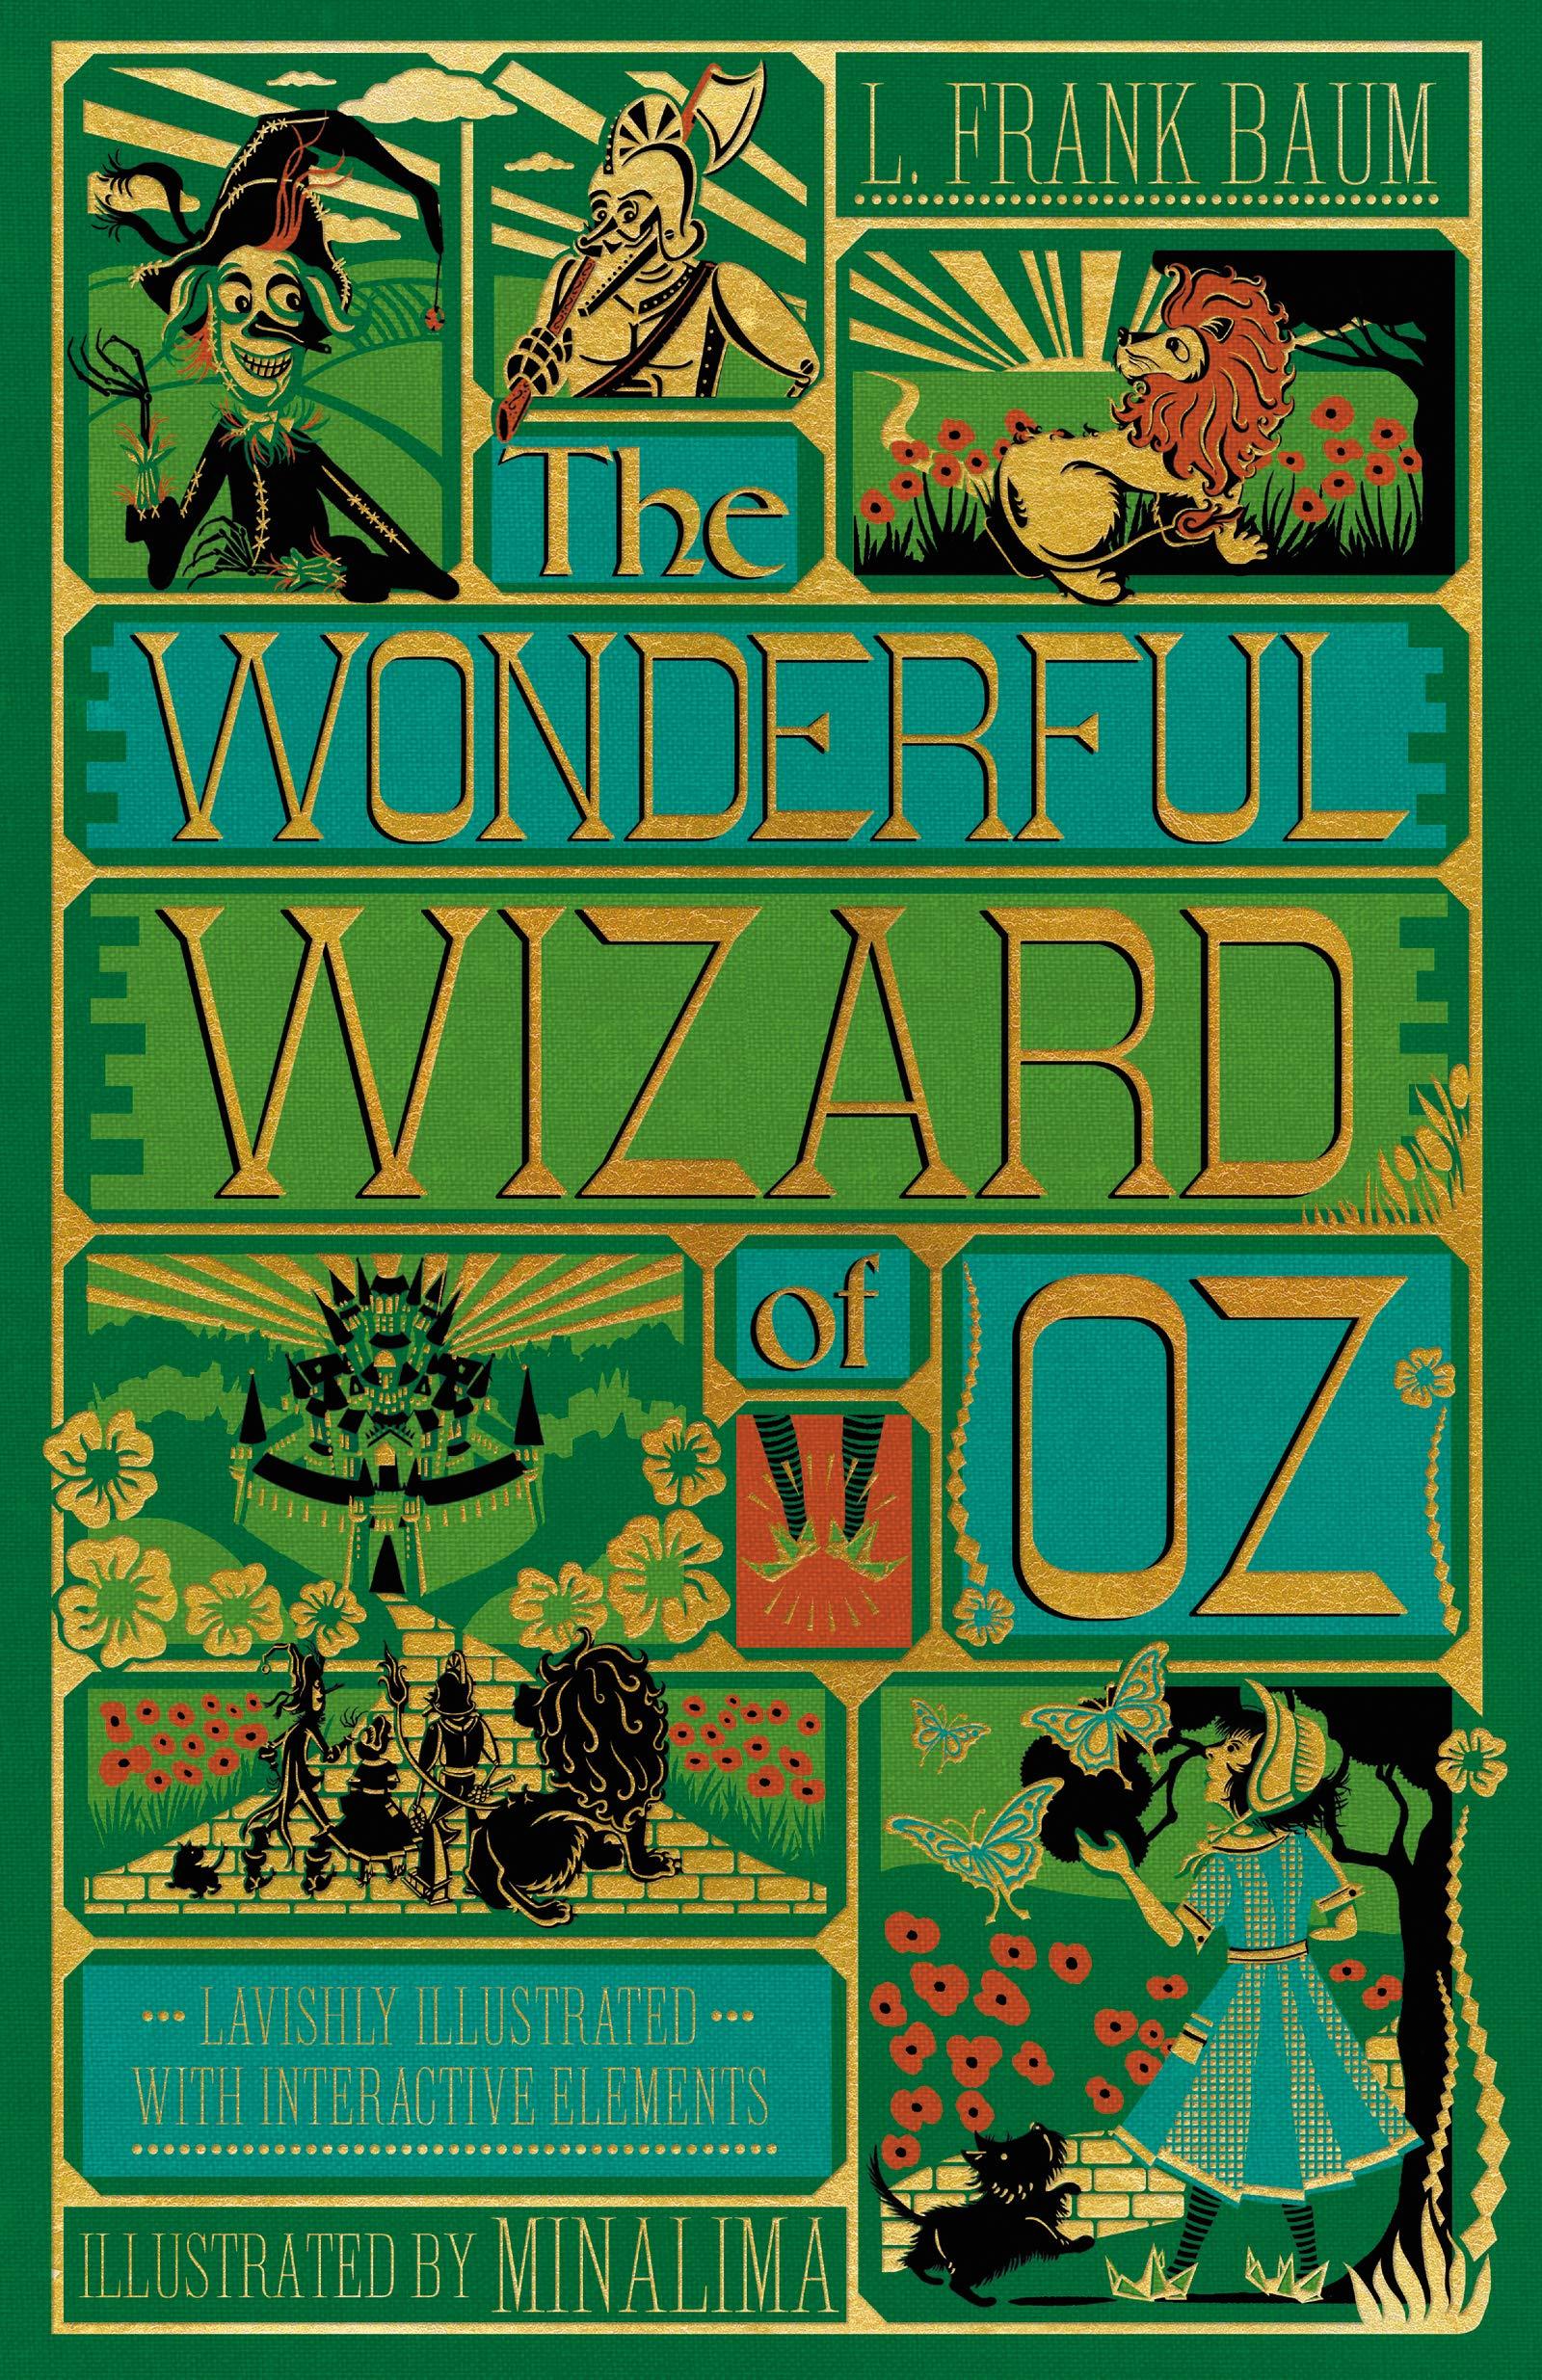 Wizard of Oz MinaLima cover